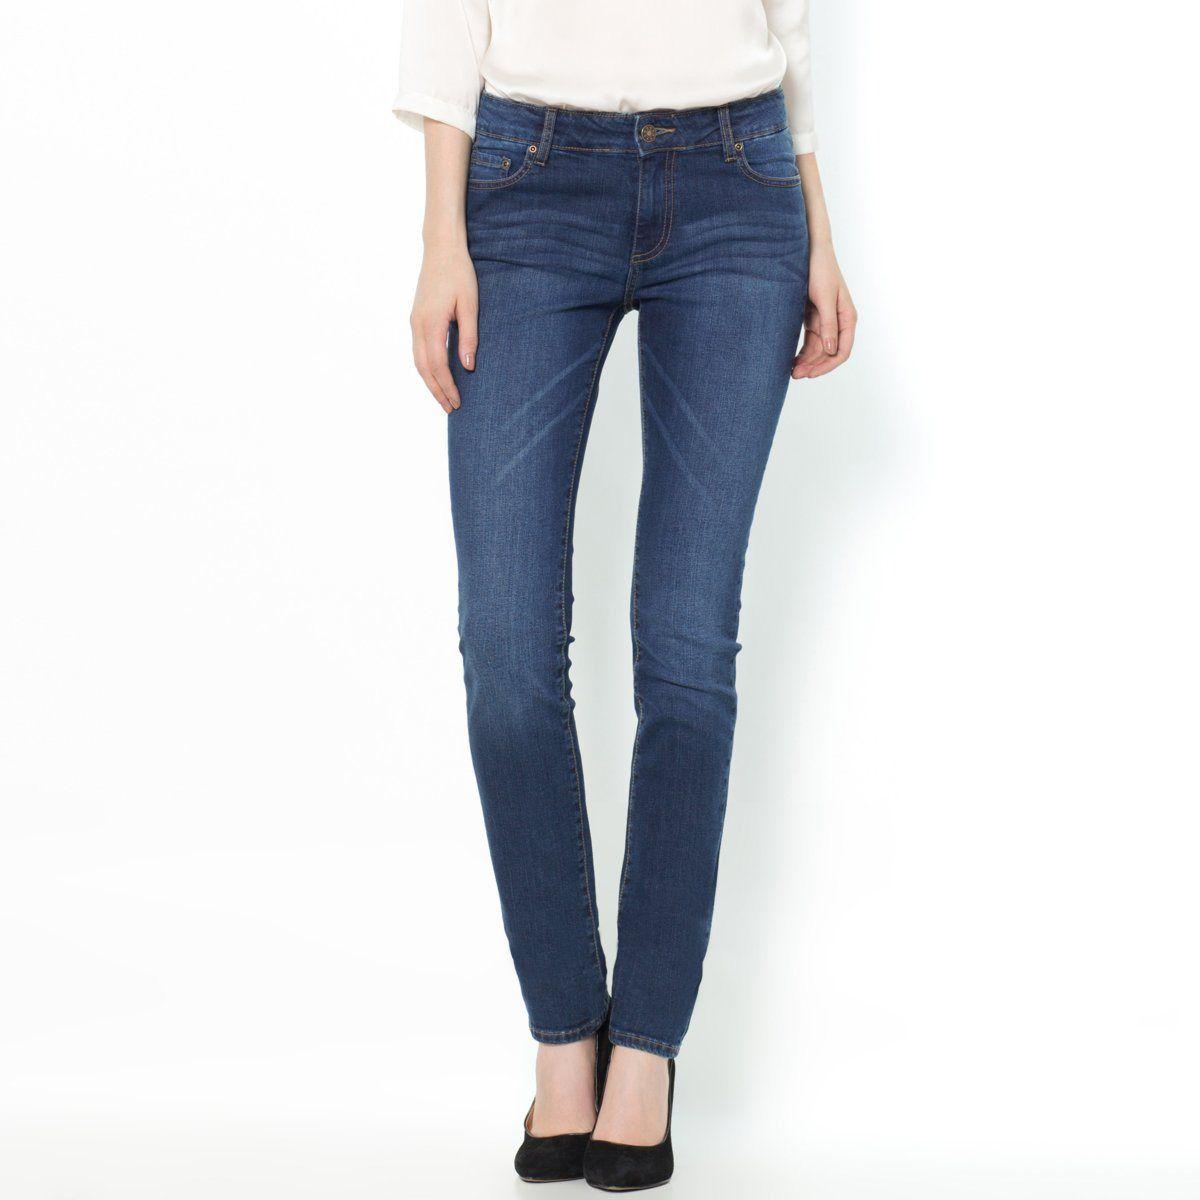 Je teste le jeans en stretch